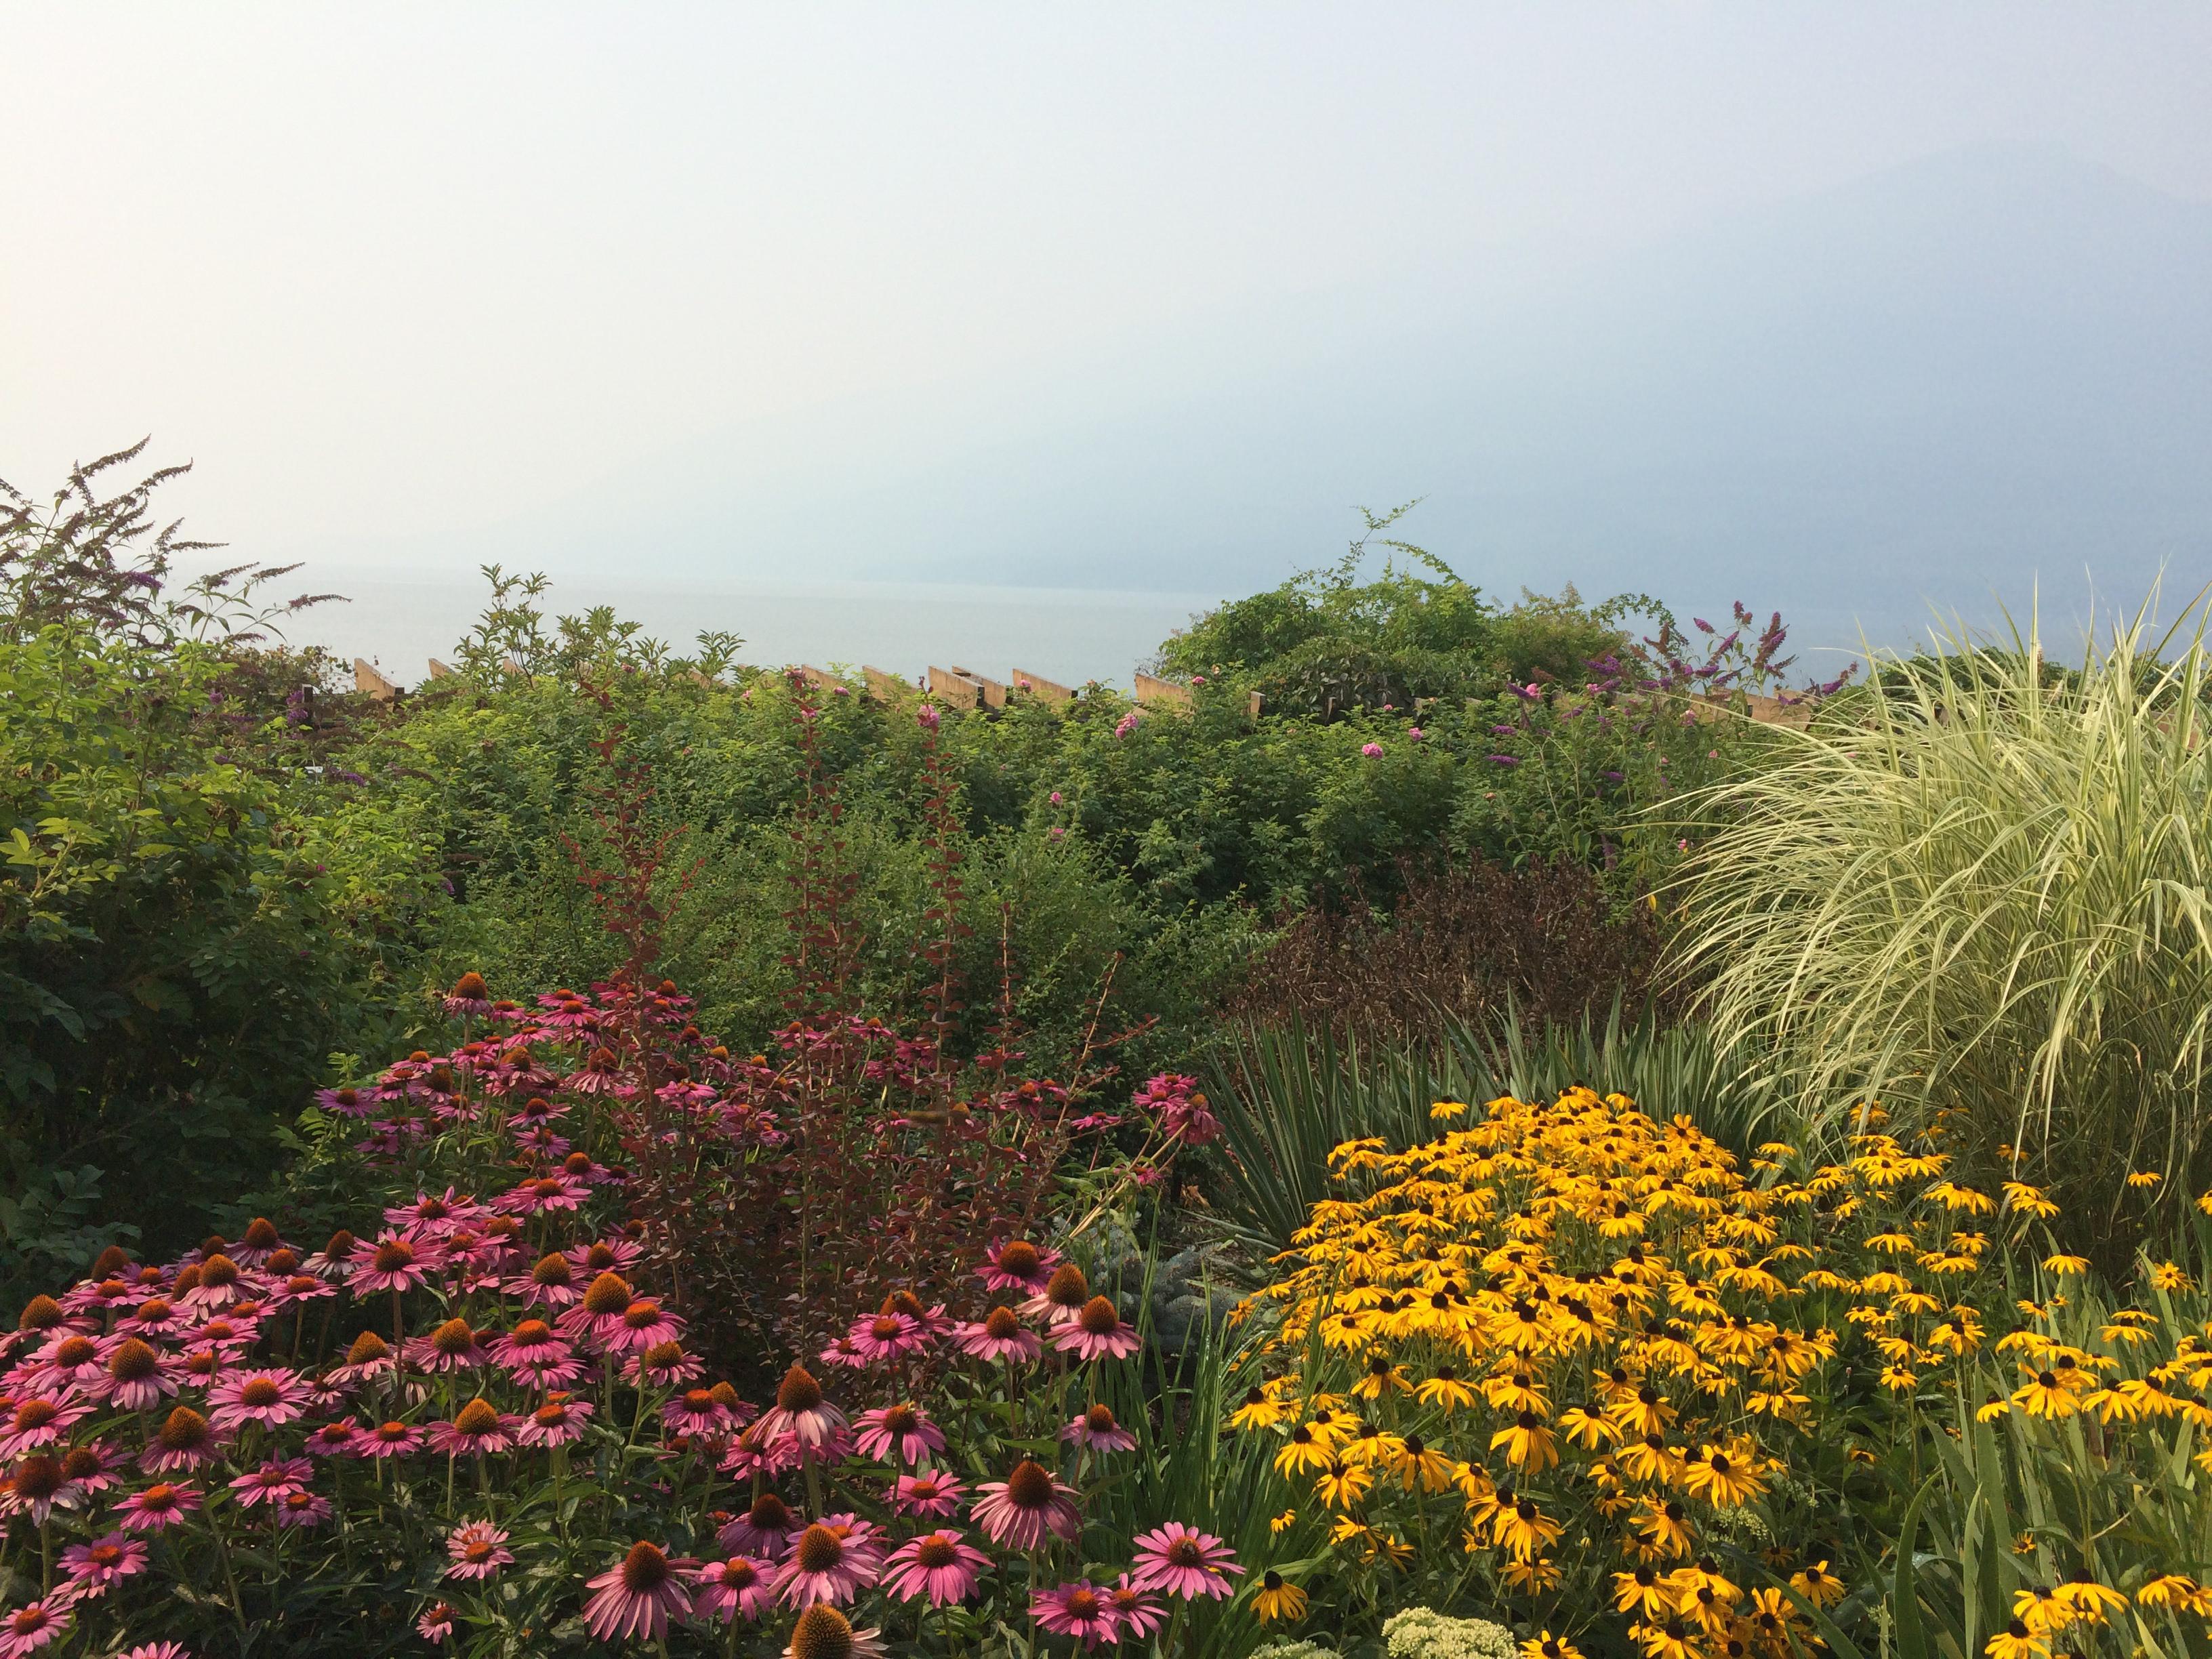 Spicer gardens, Nakusp